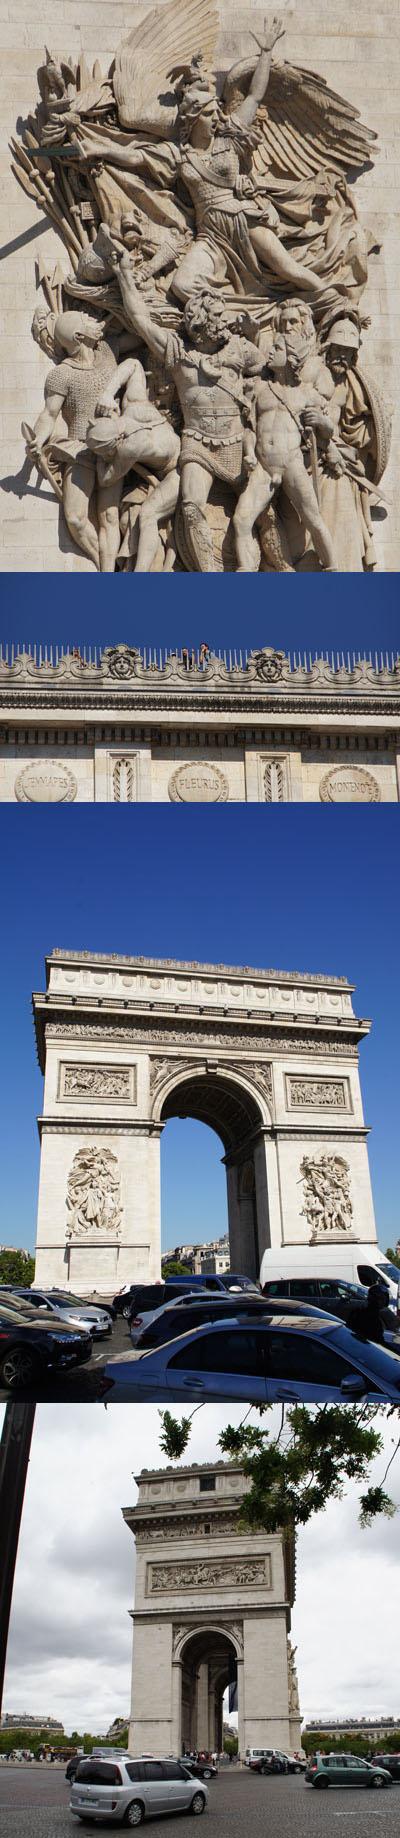 Paris Pics 4